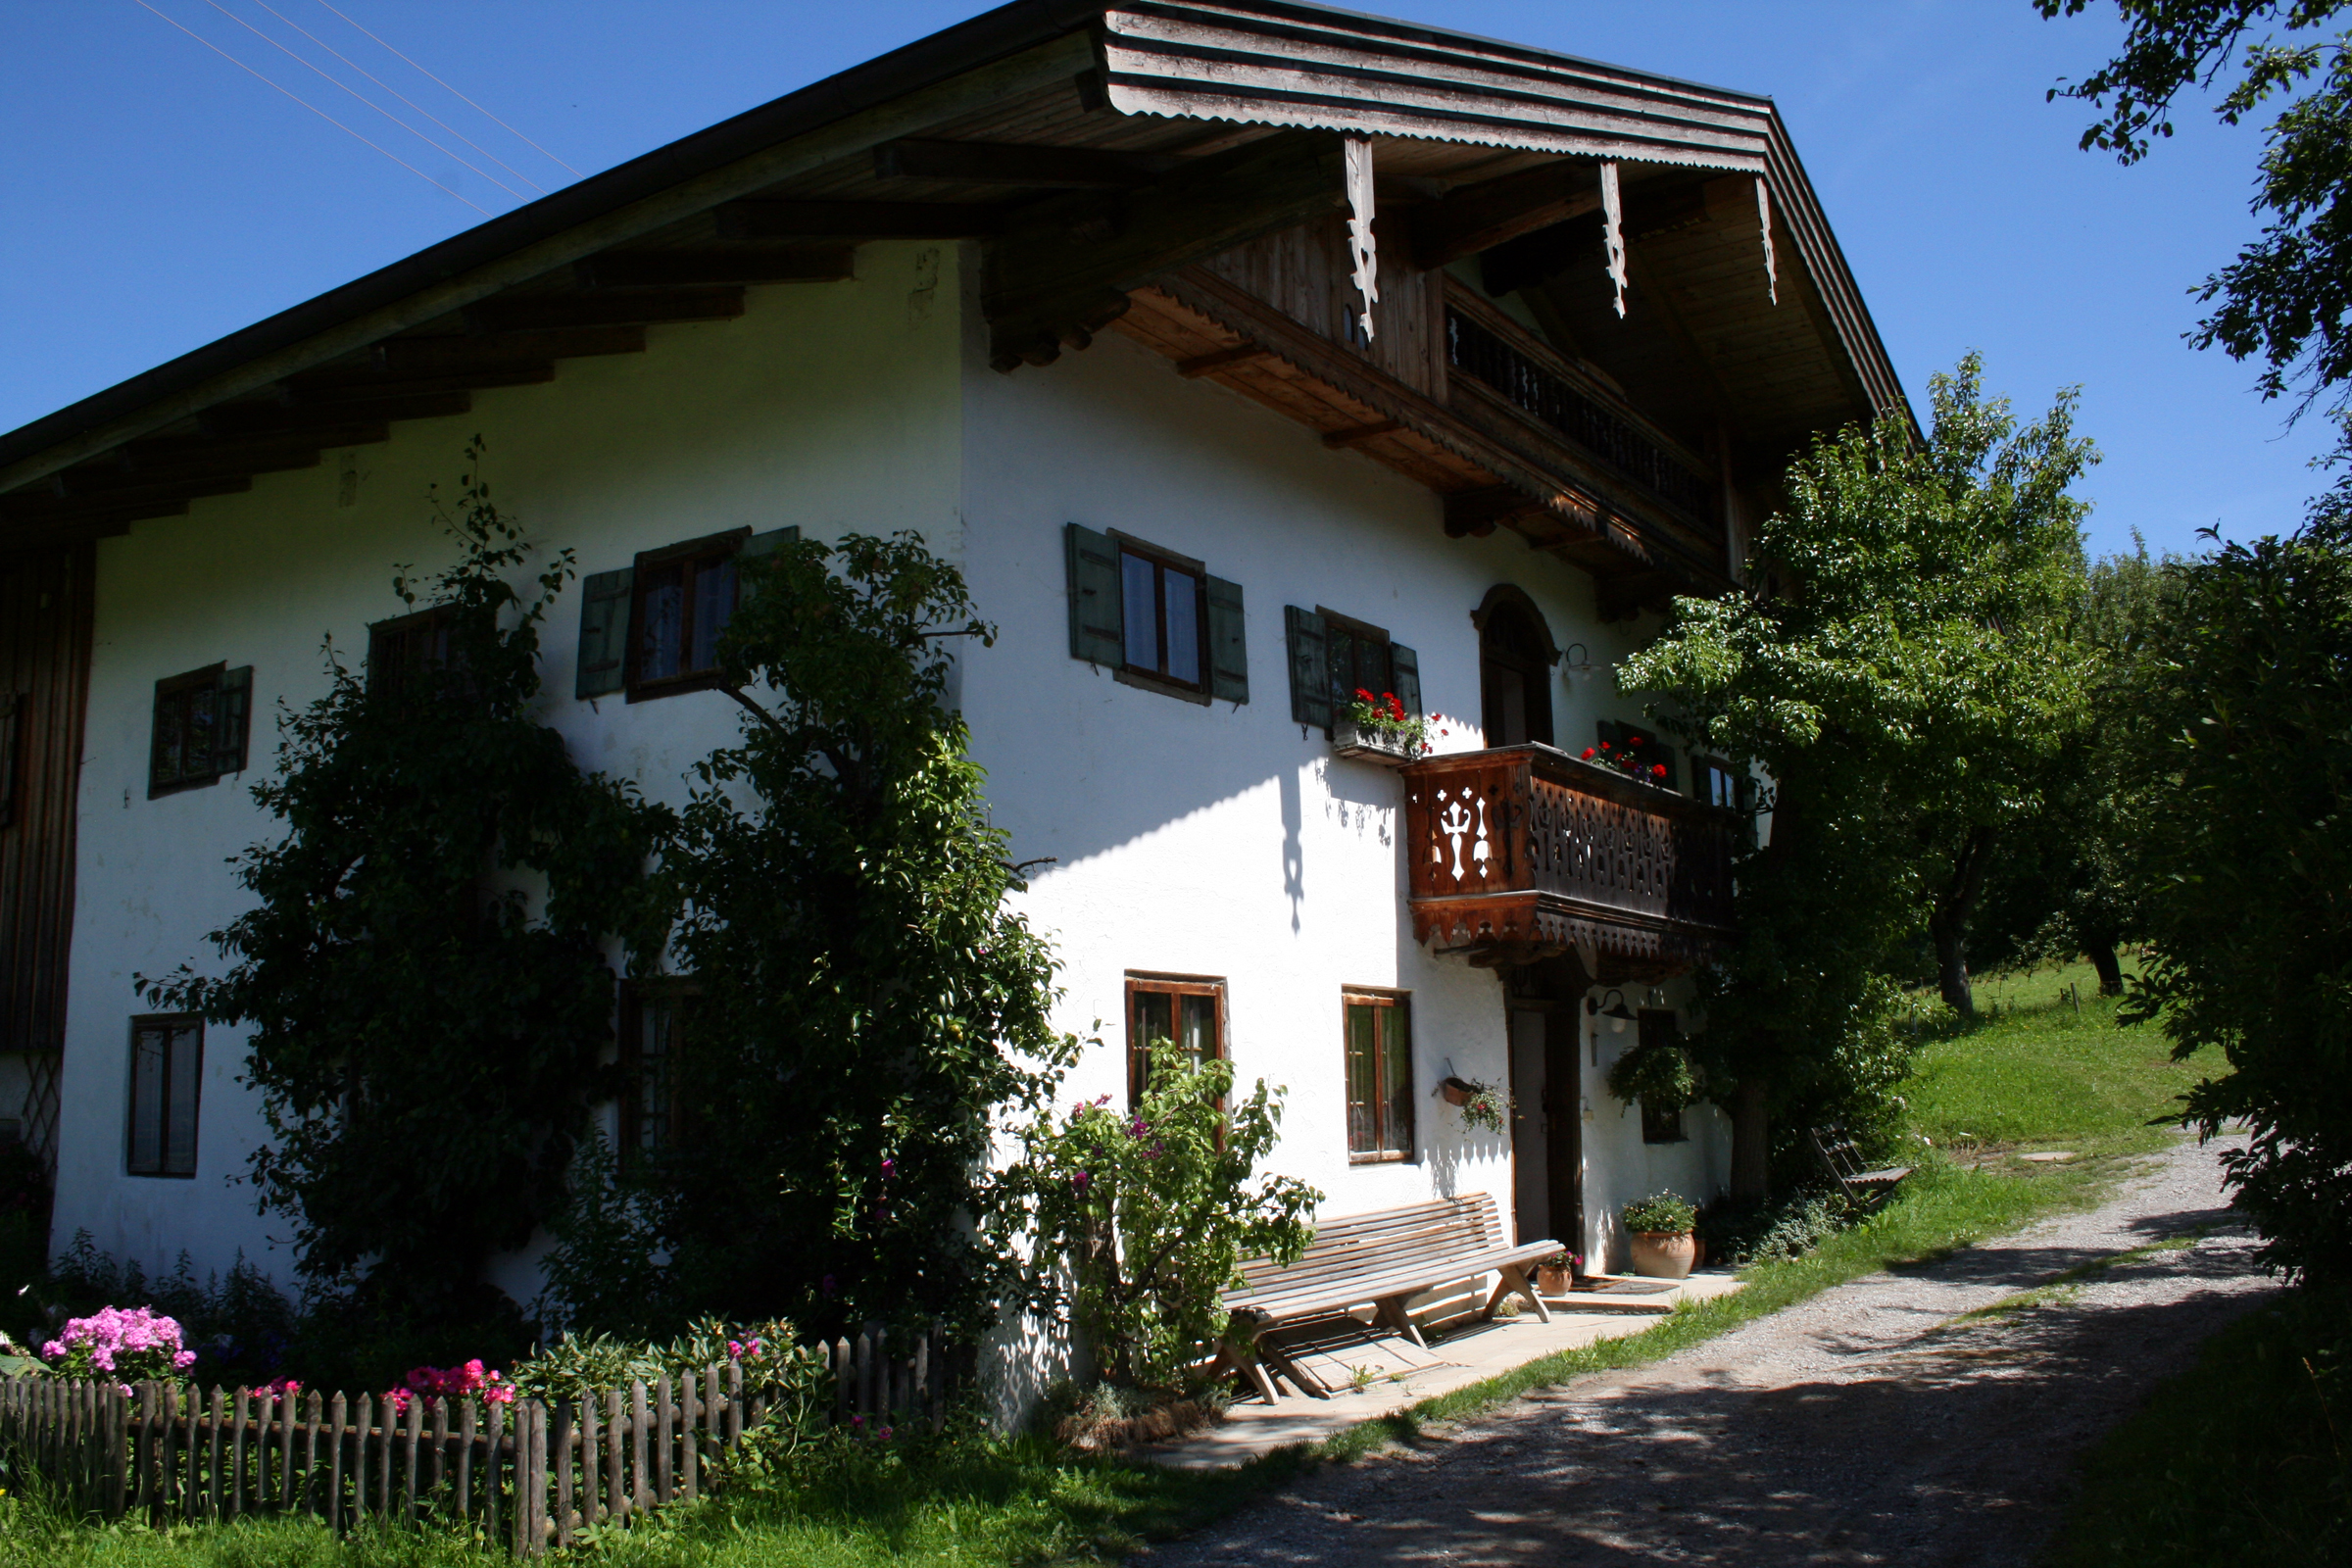 rieplhof_samerberg_oberleiten_oberbayern (28)